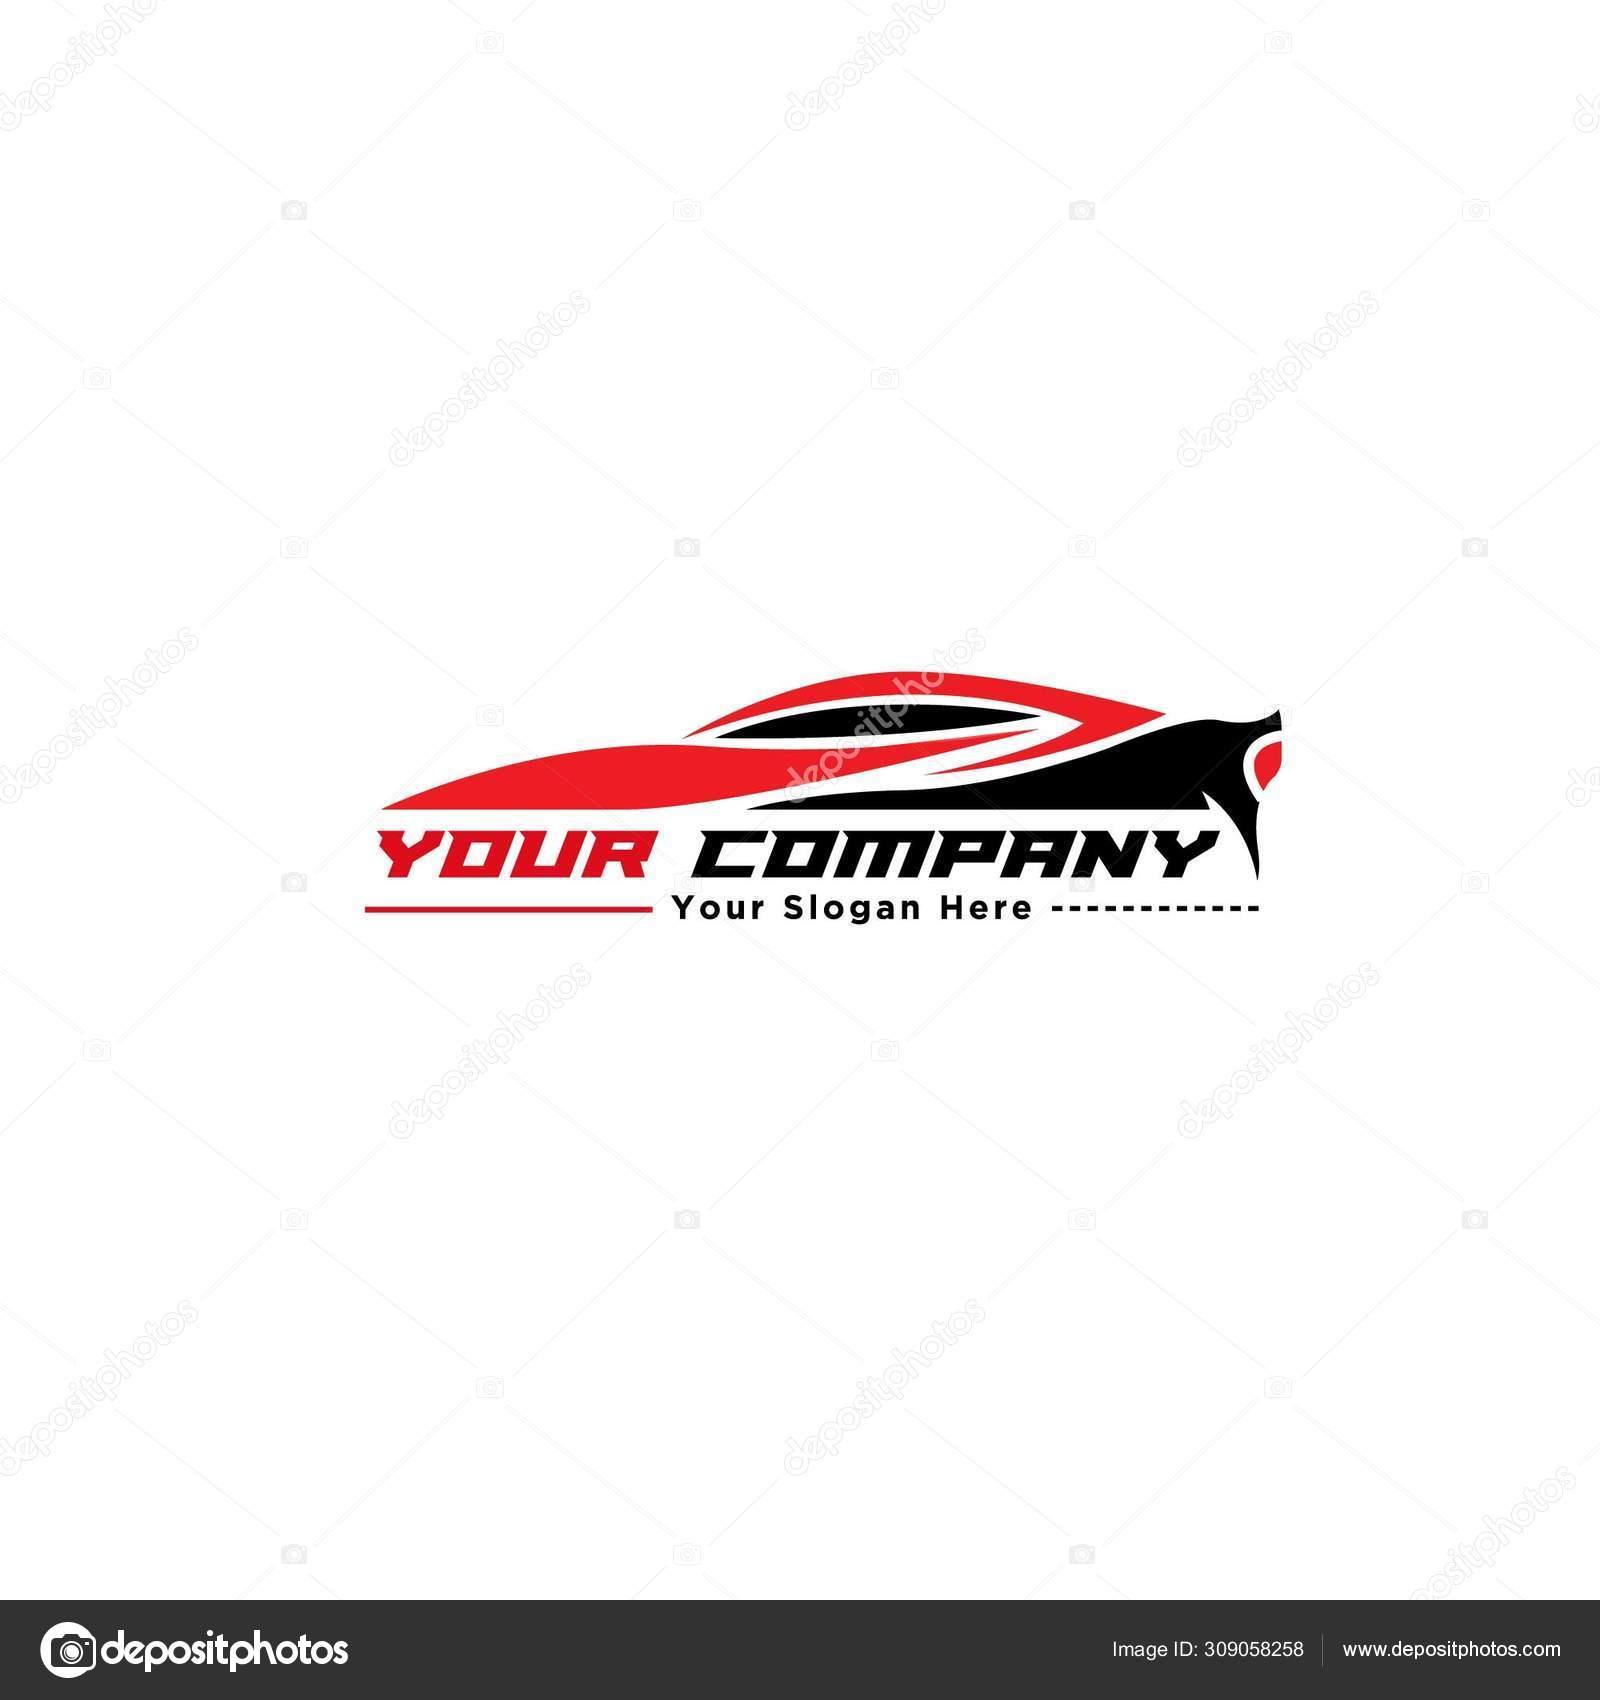 Red And Black Sport Car Logo Design Silhouette Stock Vector C Saferizen 309058258